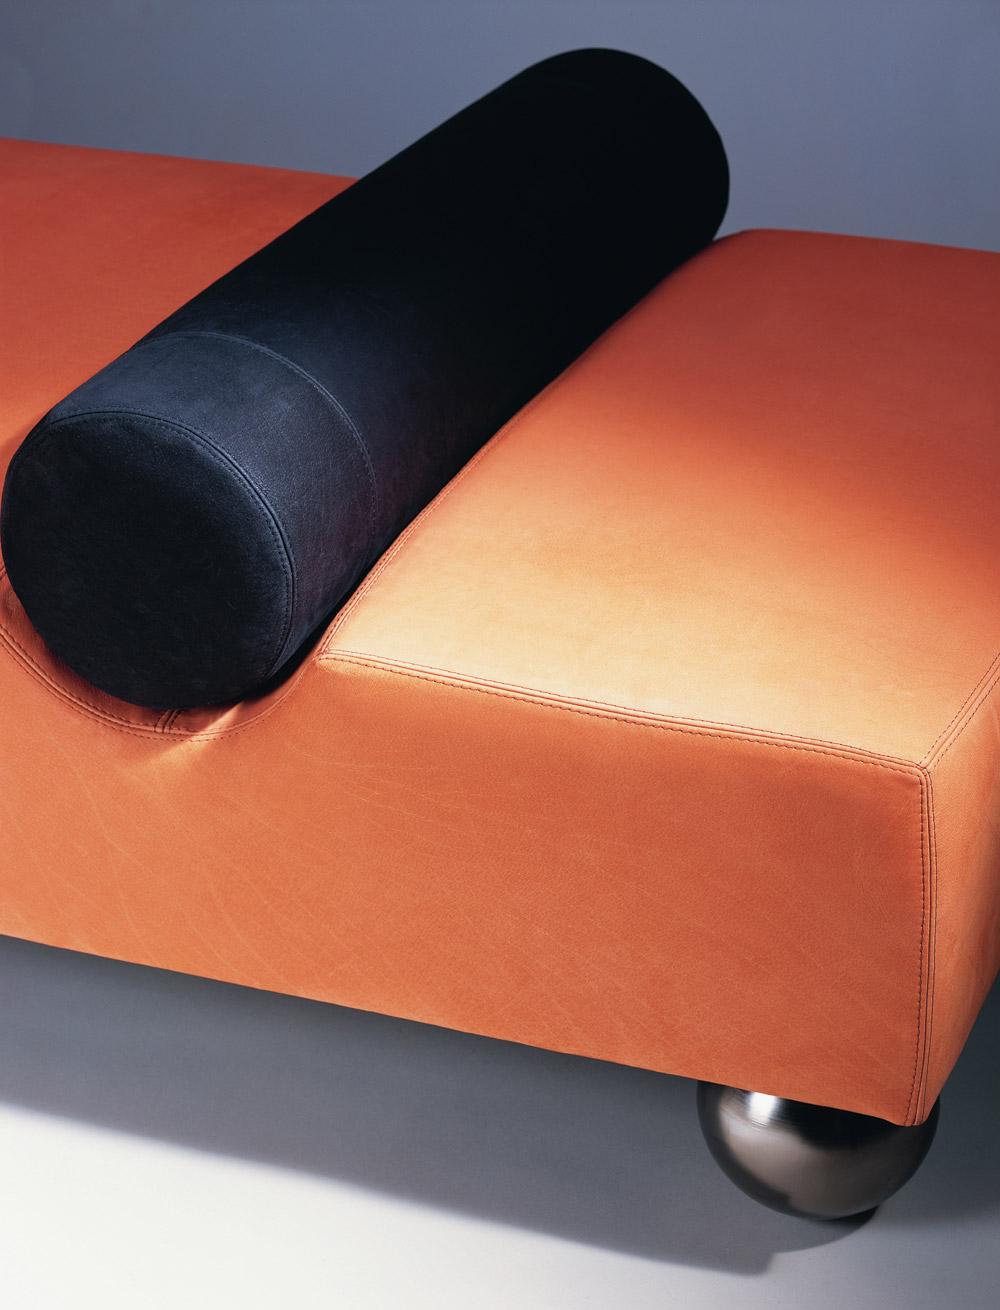 Custom furniture design luxury seating meridienne psy orange black leather close up